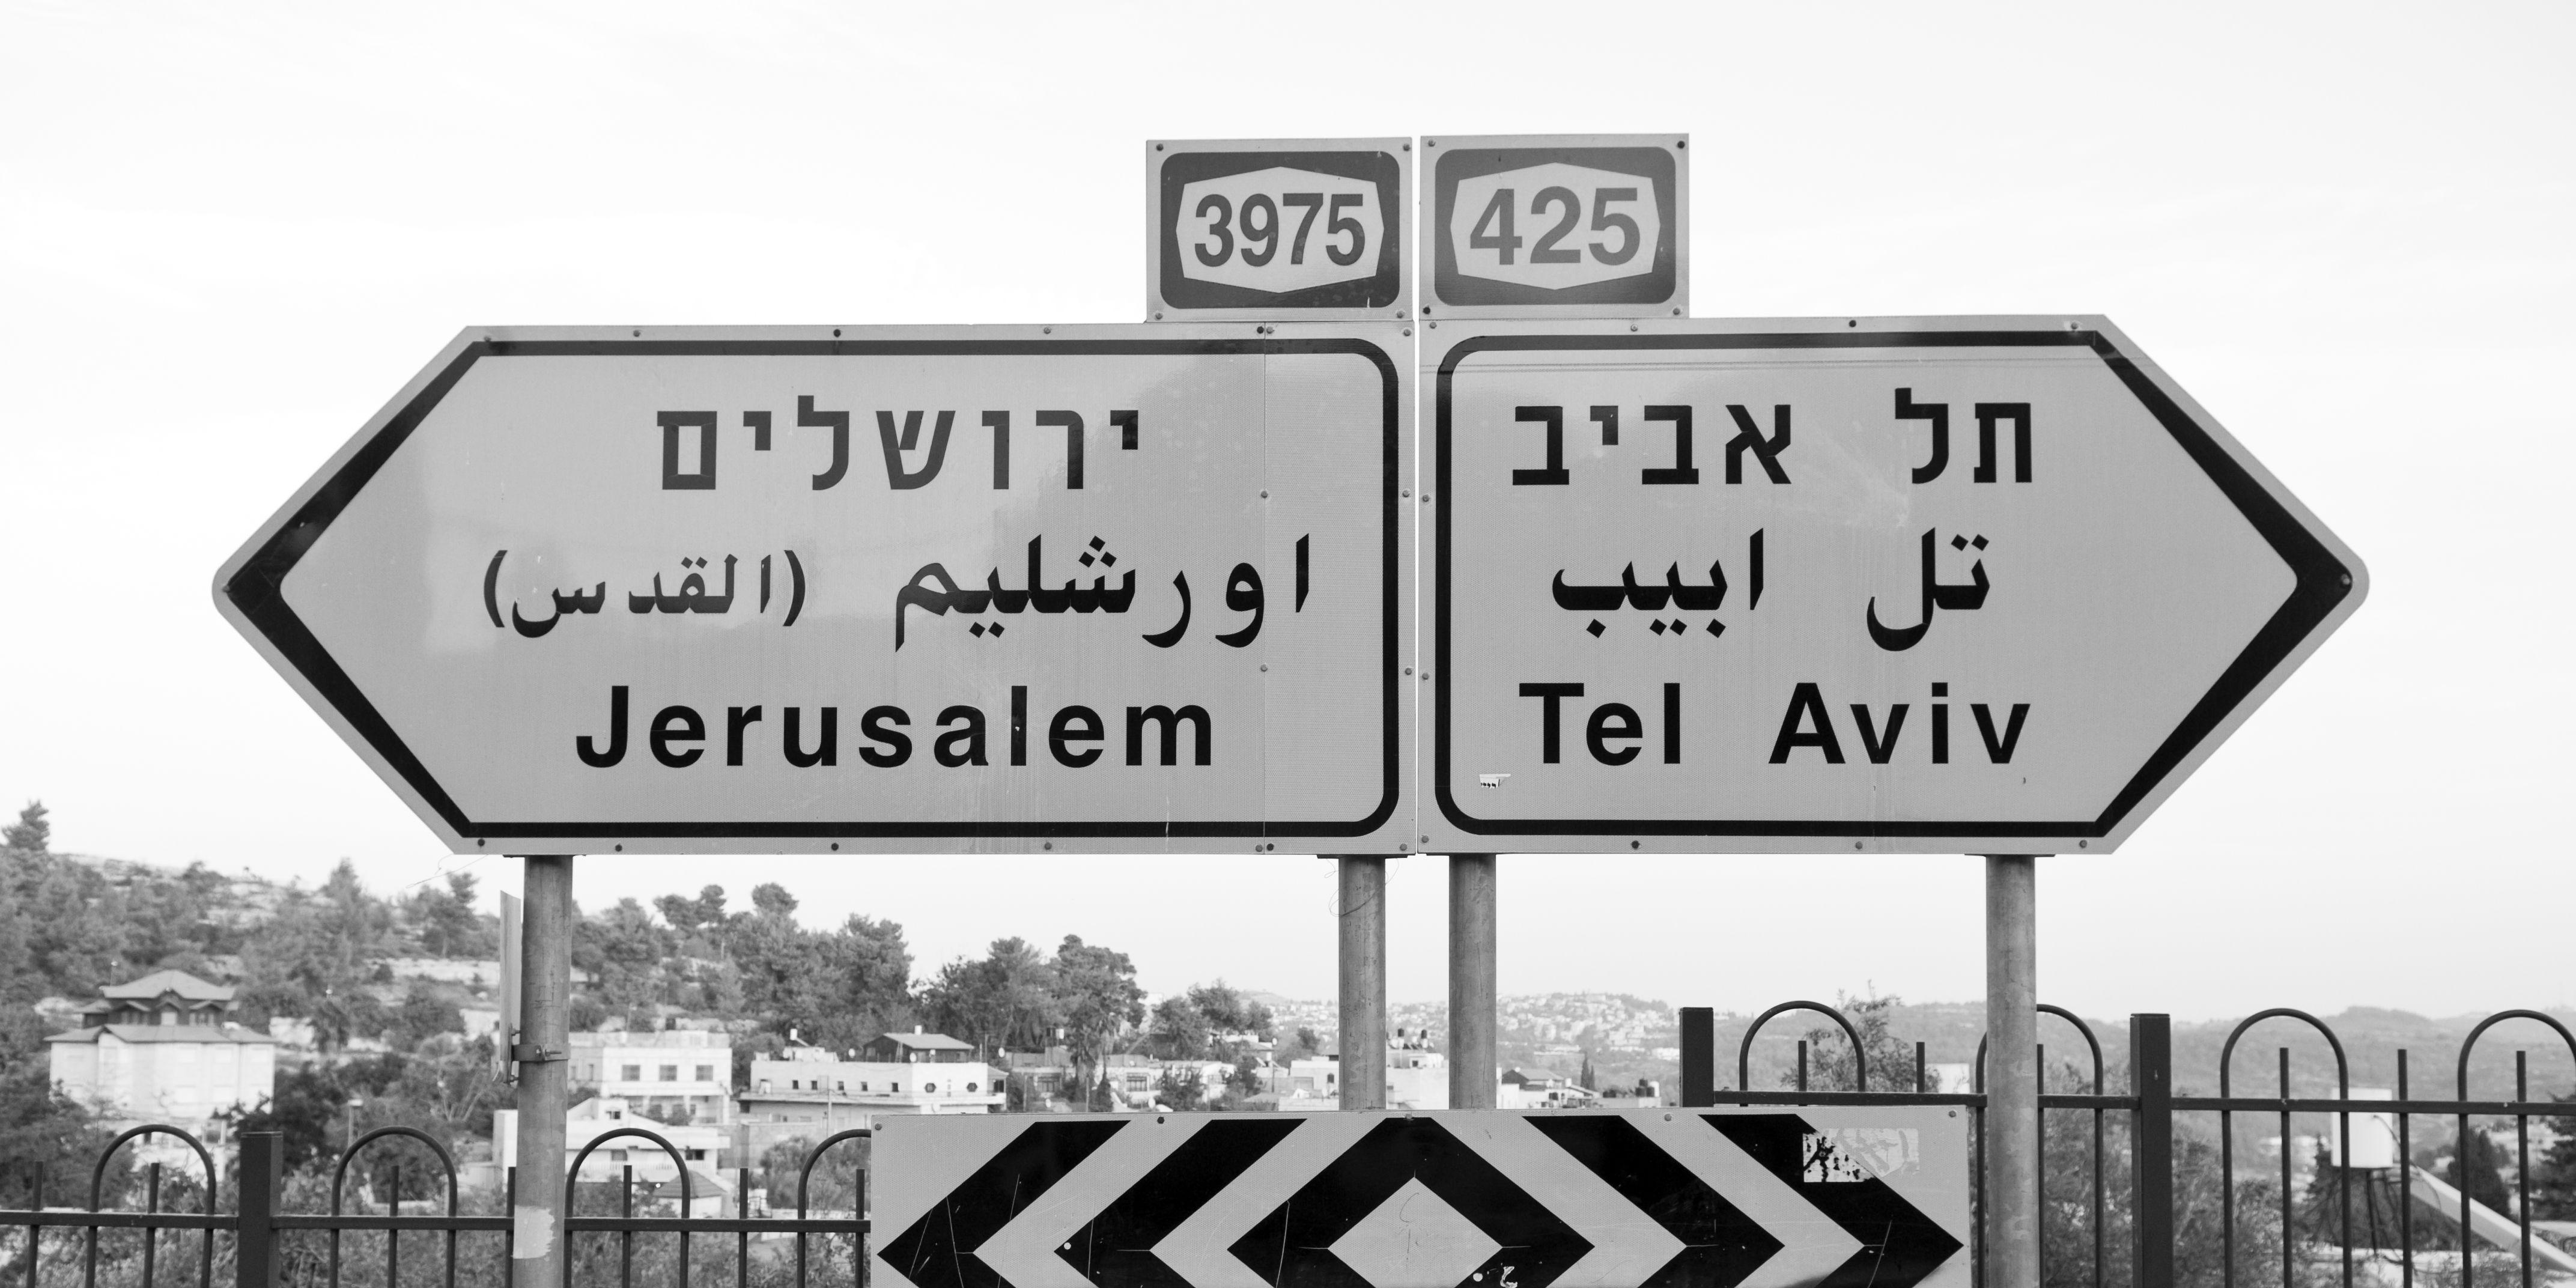 Jerusalem and Tel Aviv road signs